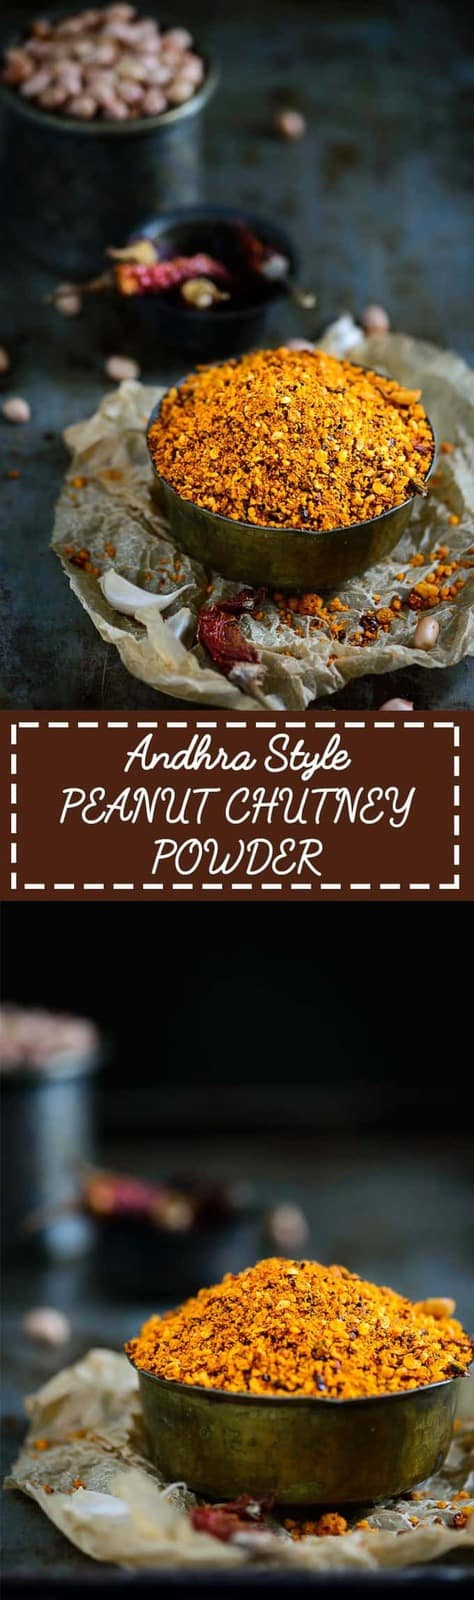 Andhra Style Peanut Powder